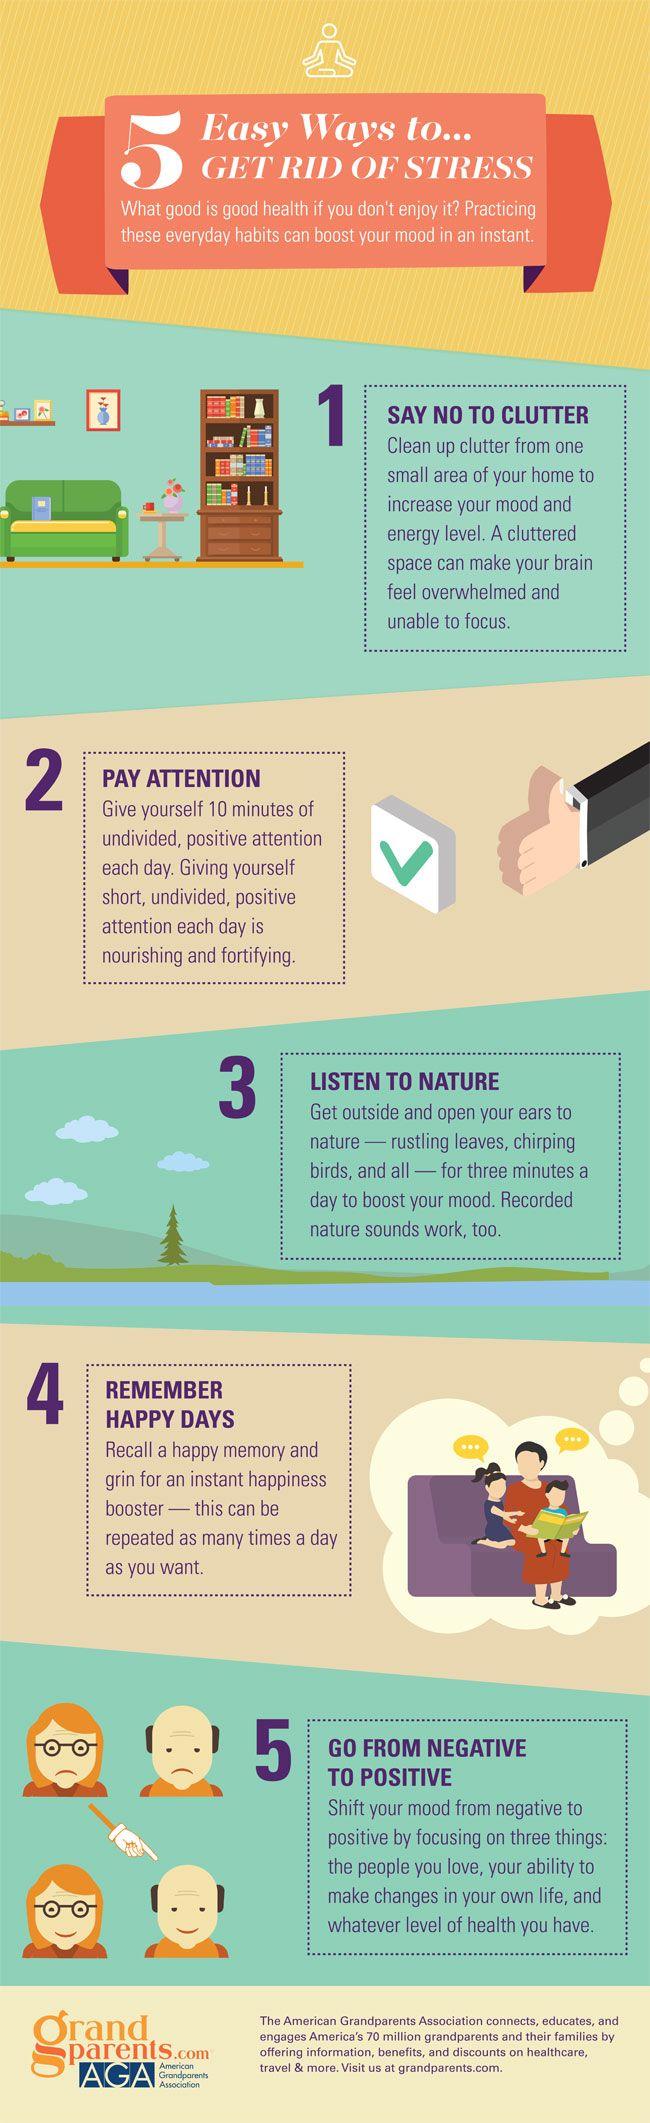 bc777b53e9ea9155ad9ab5c16e7d2f7a - How To Get Rid Of Stress Feeling In Stomach